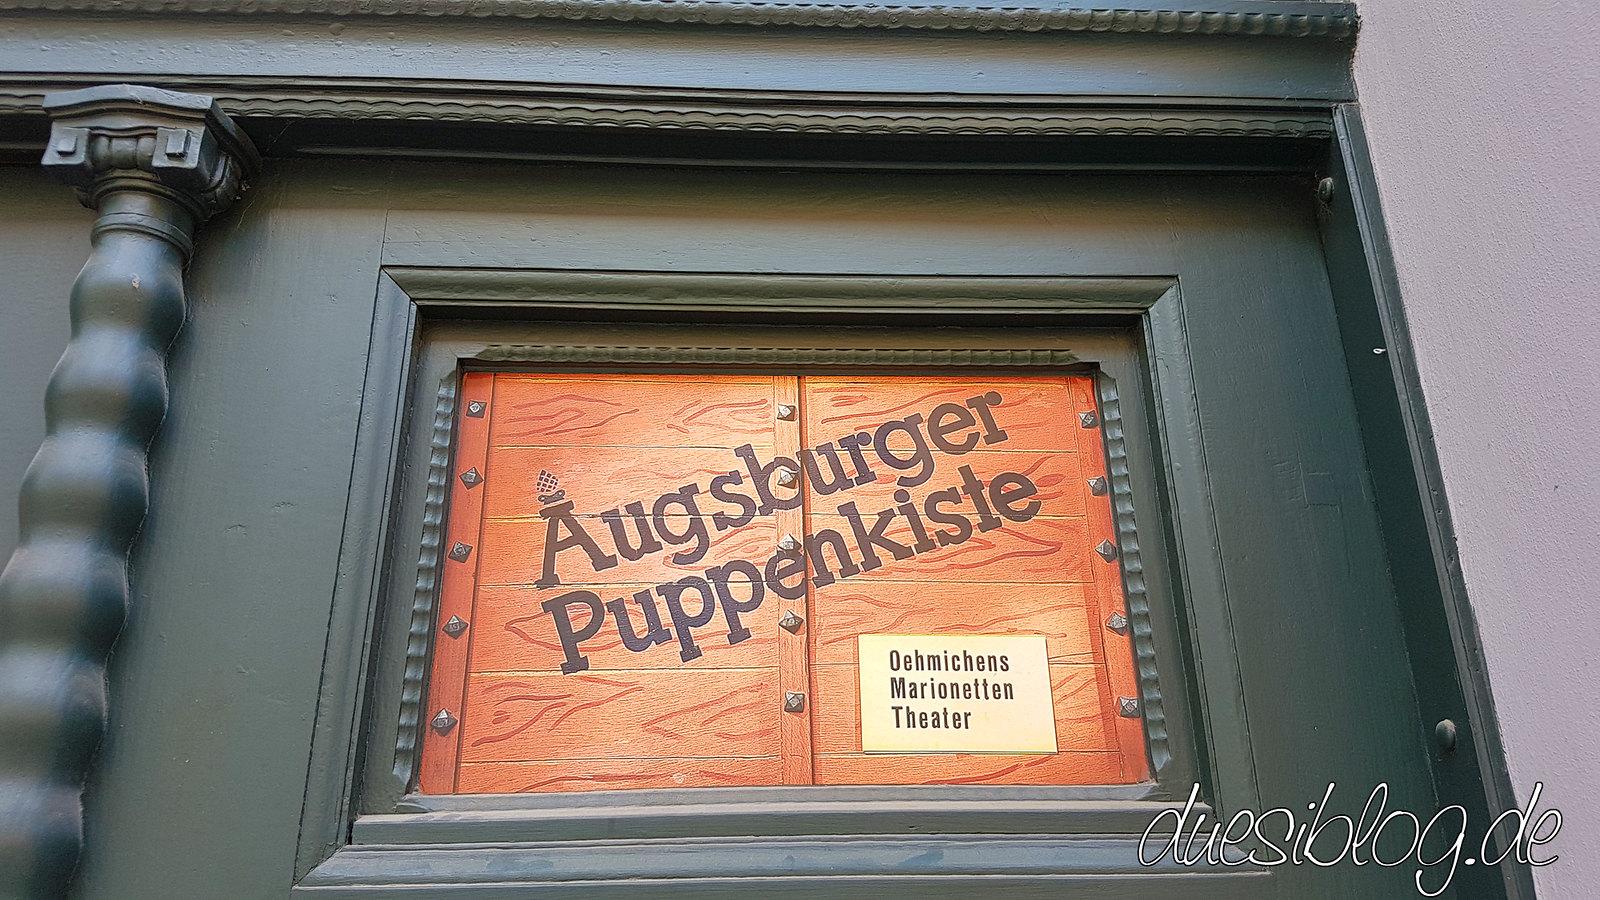 Augsburg duesiblog 10